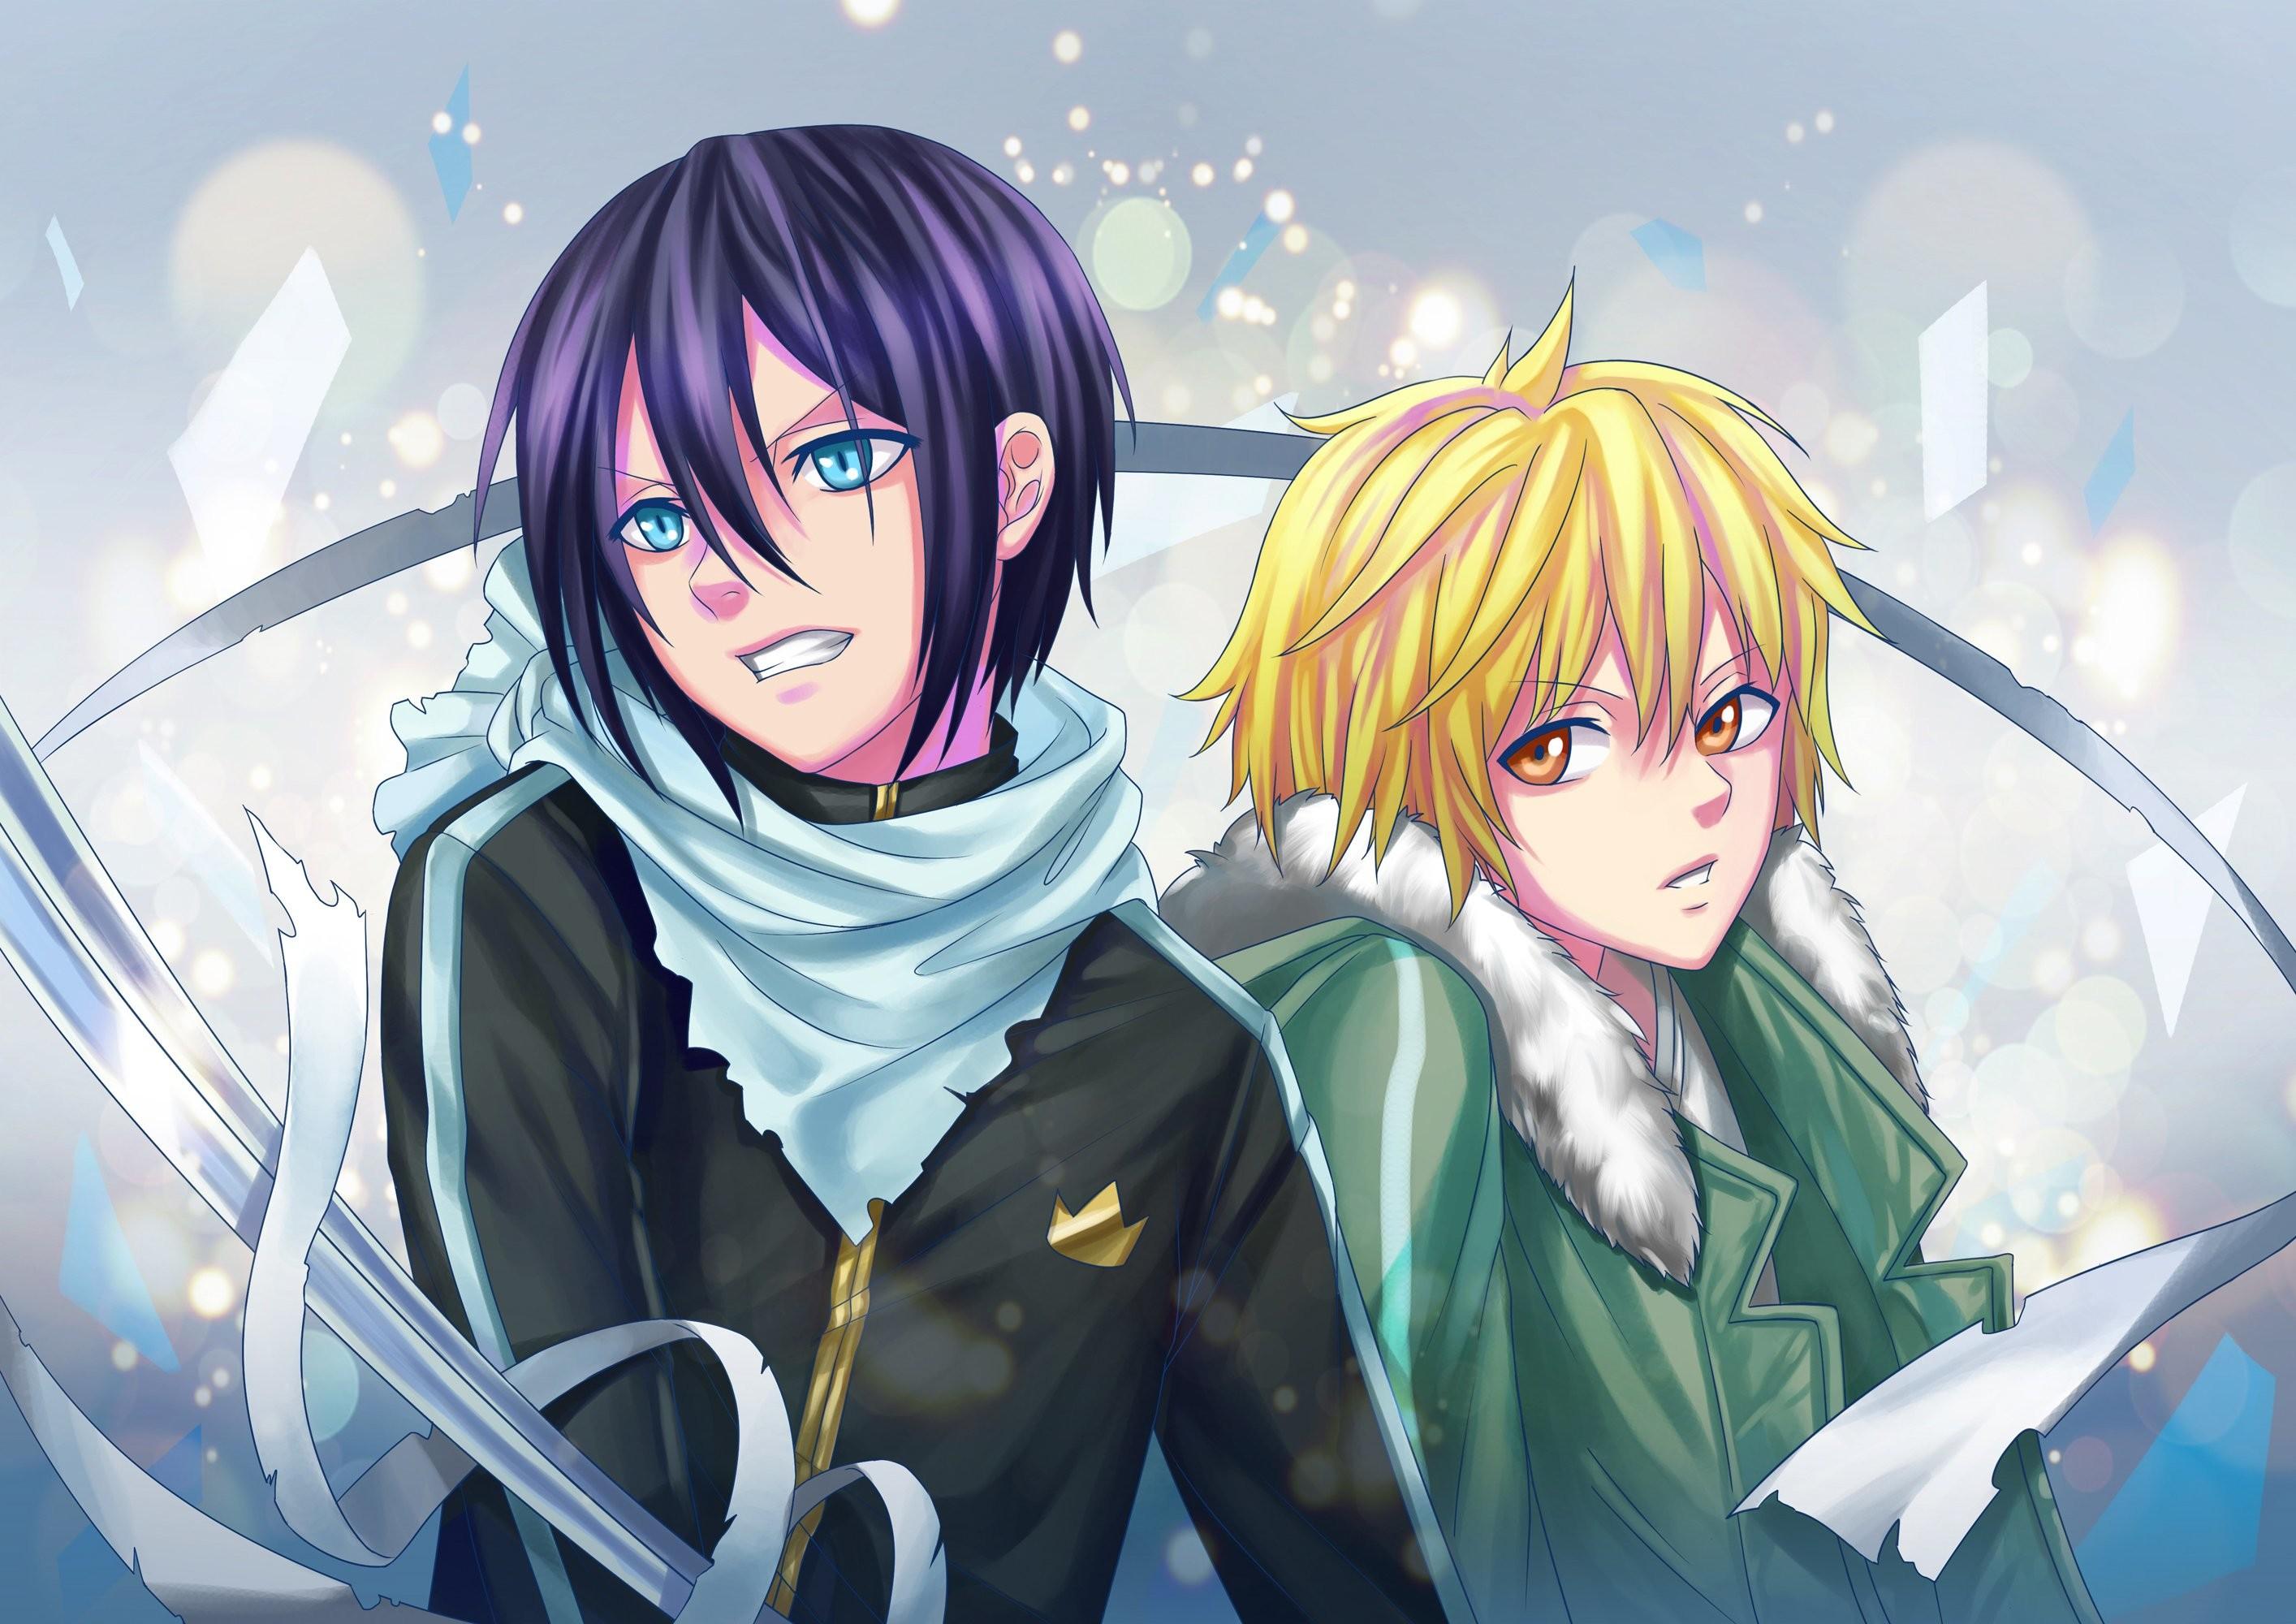 2560×1440 Anime Noragami Noragami wallpaper entitled Yato and Yukine Hiyori  …